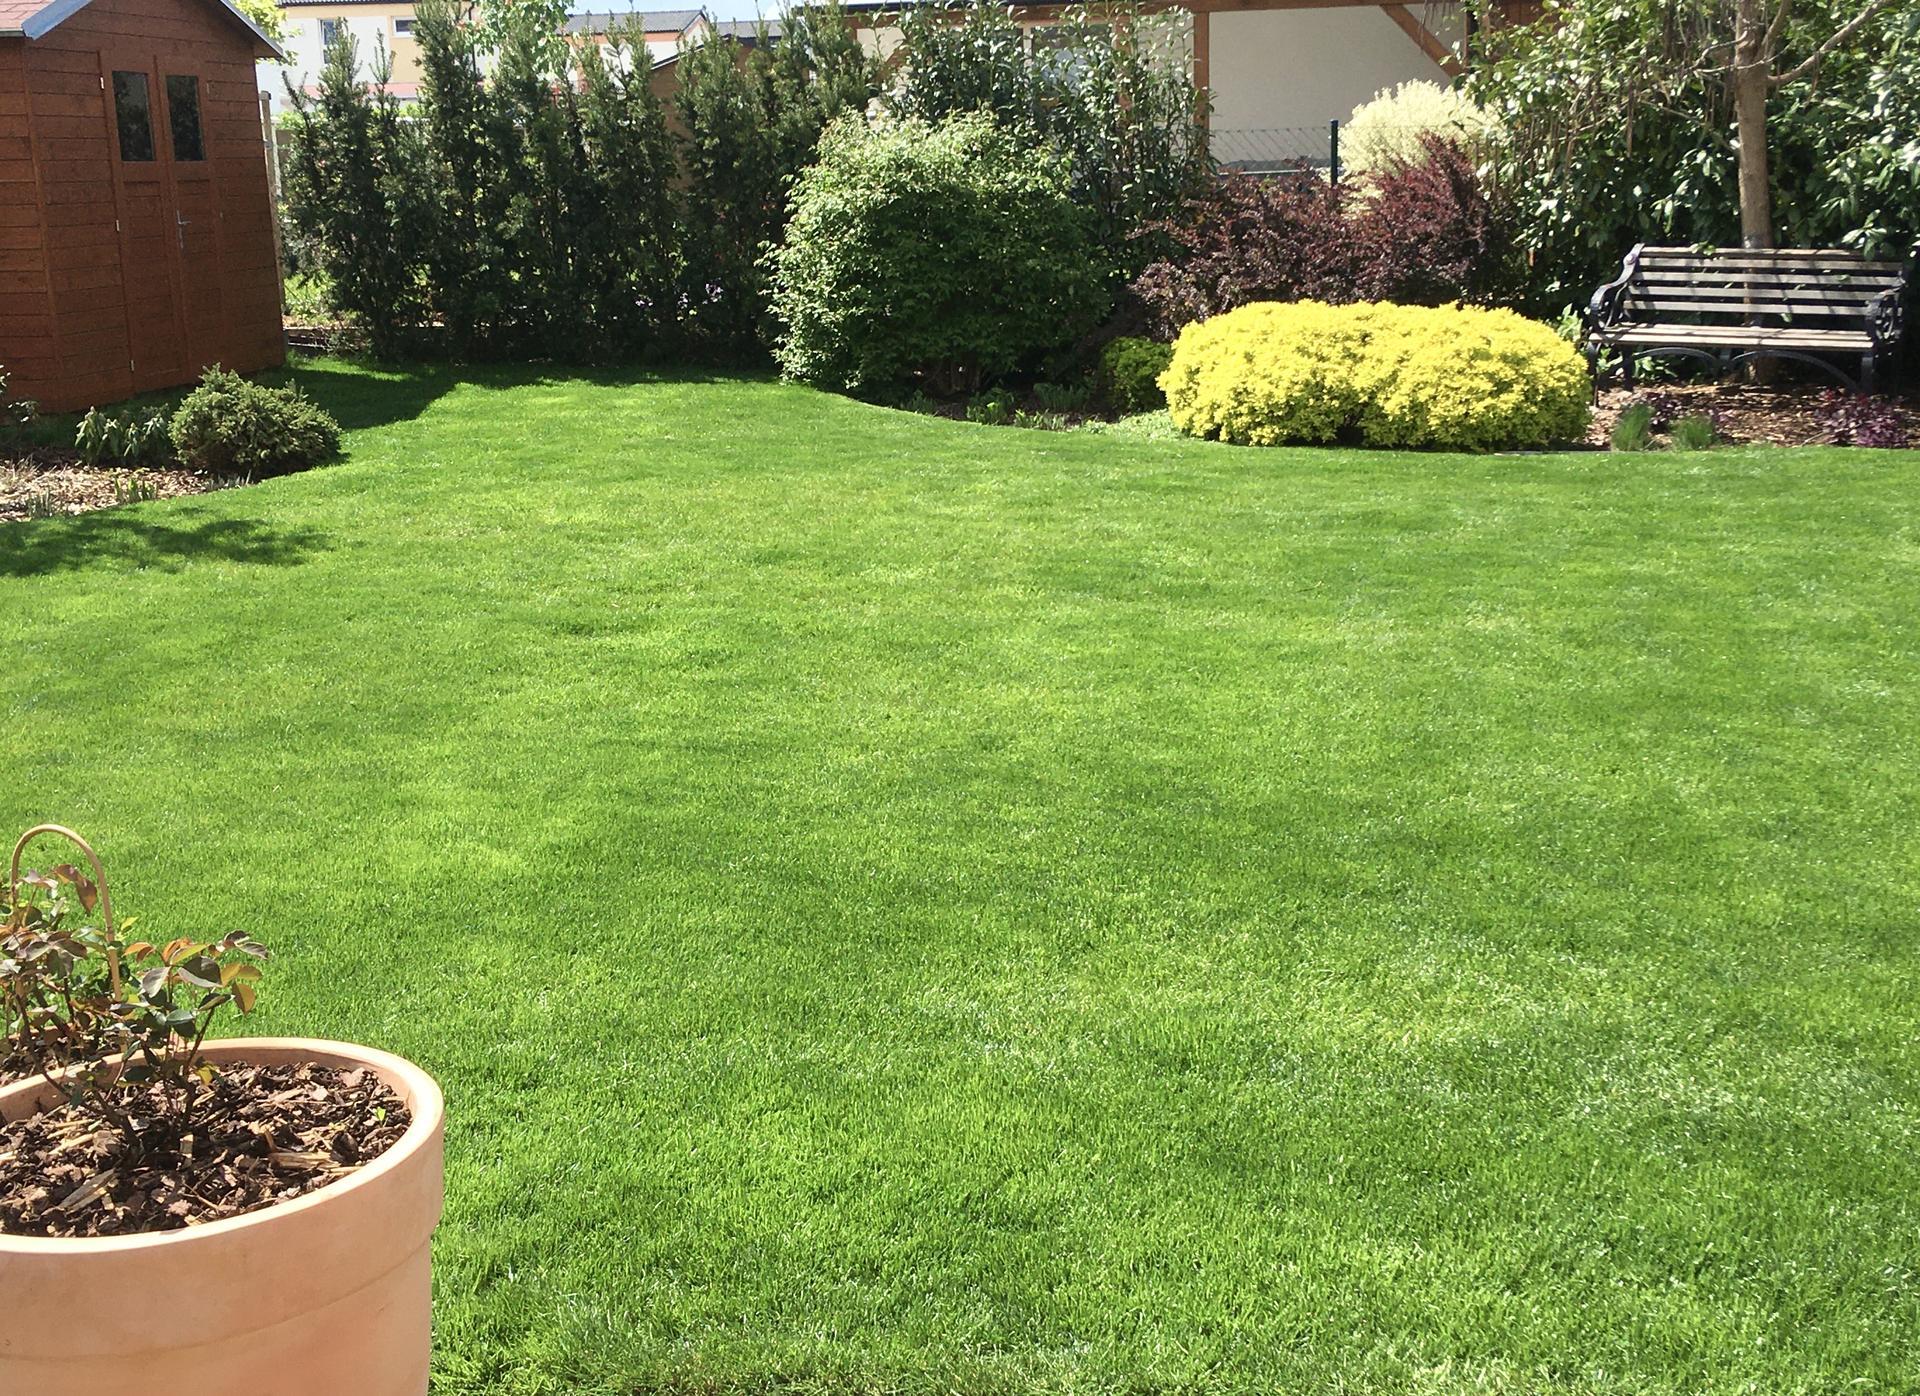 Zahrada 2020 - travnicek ma po desti super barvu, kez by mu vydrzela ❤️!